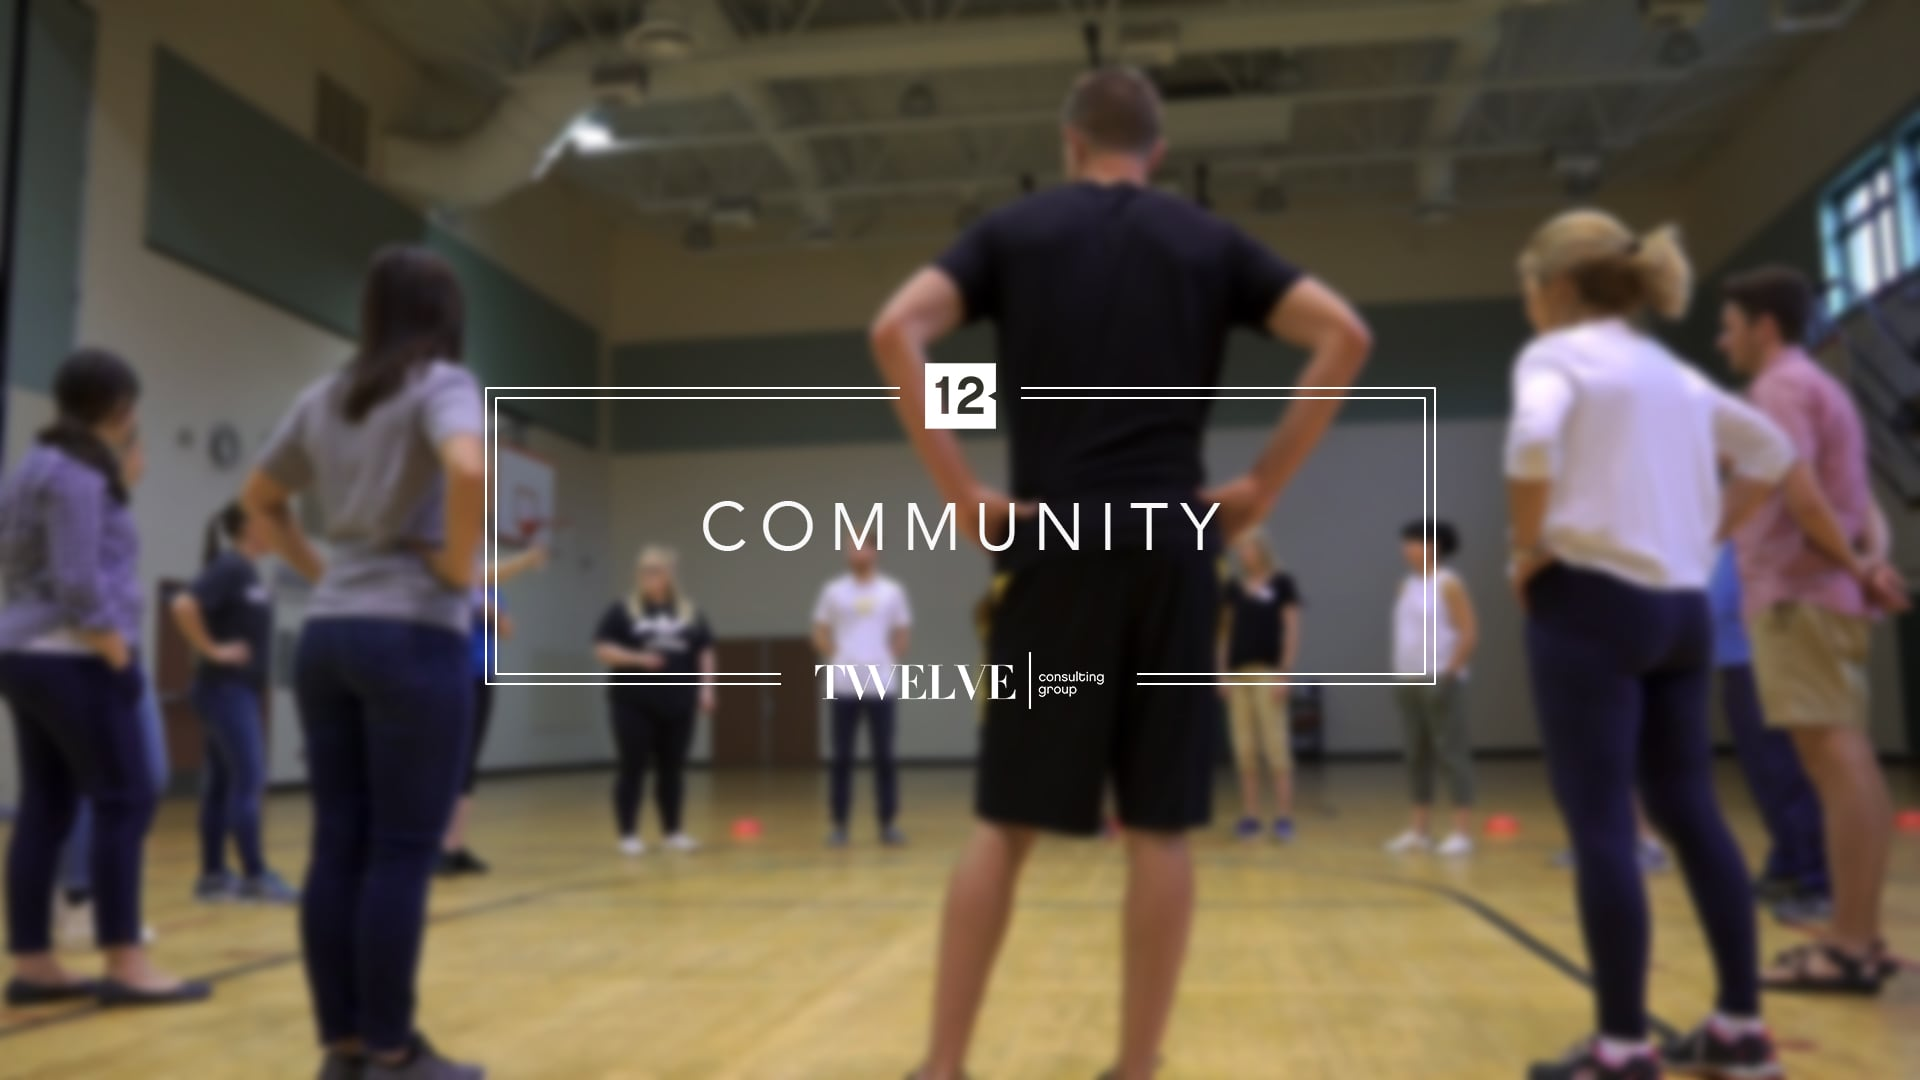 Twelve in the Community